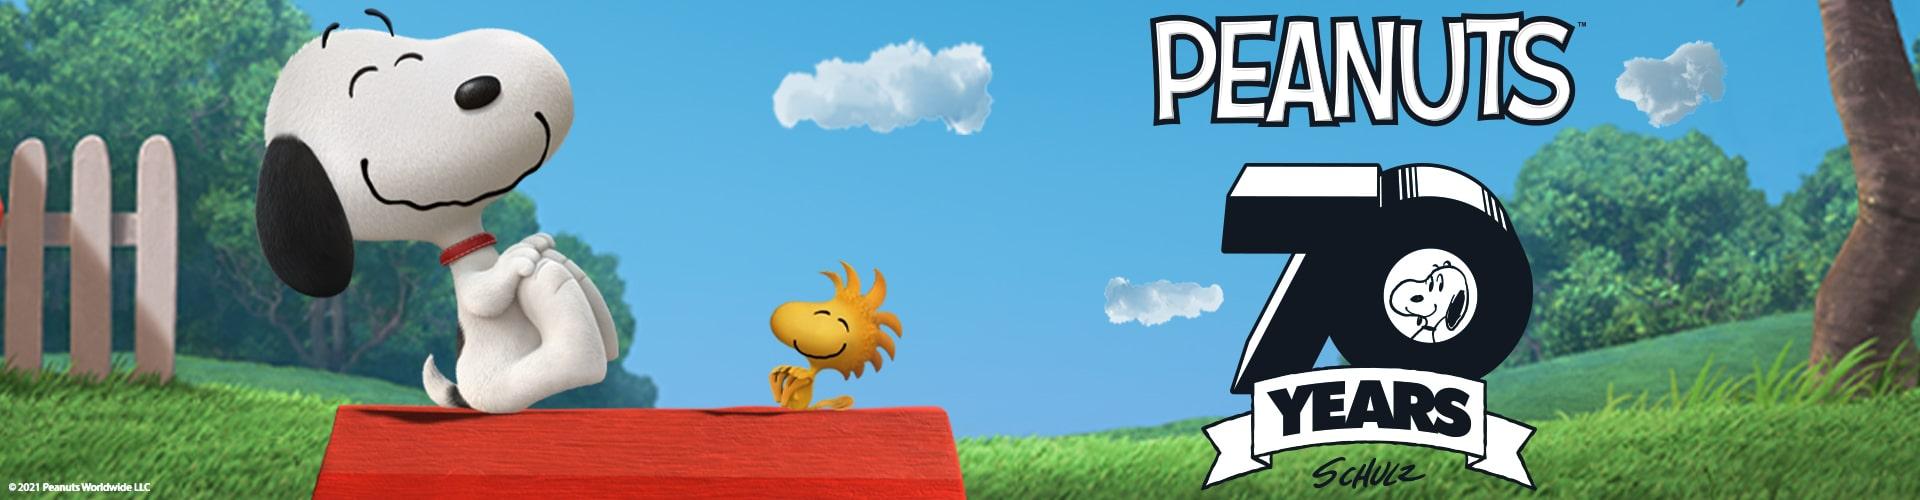 70 years of Peanuts 1920×500 copy-min